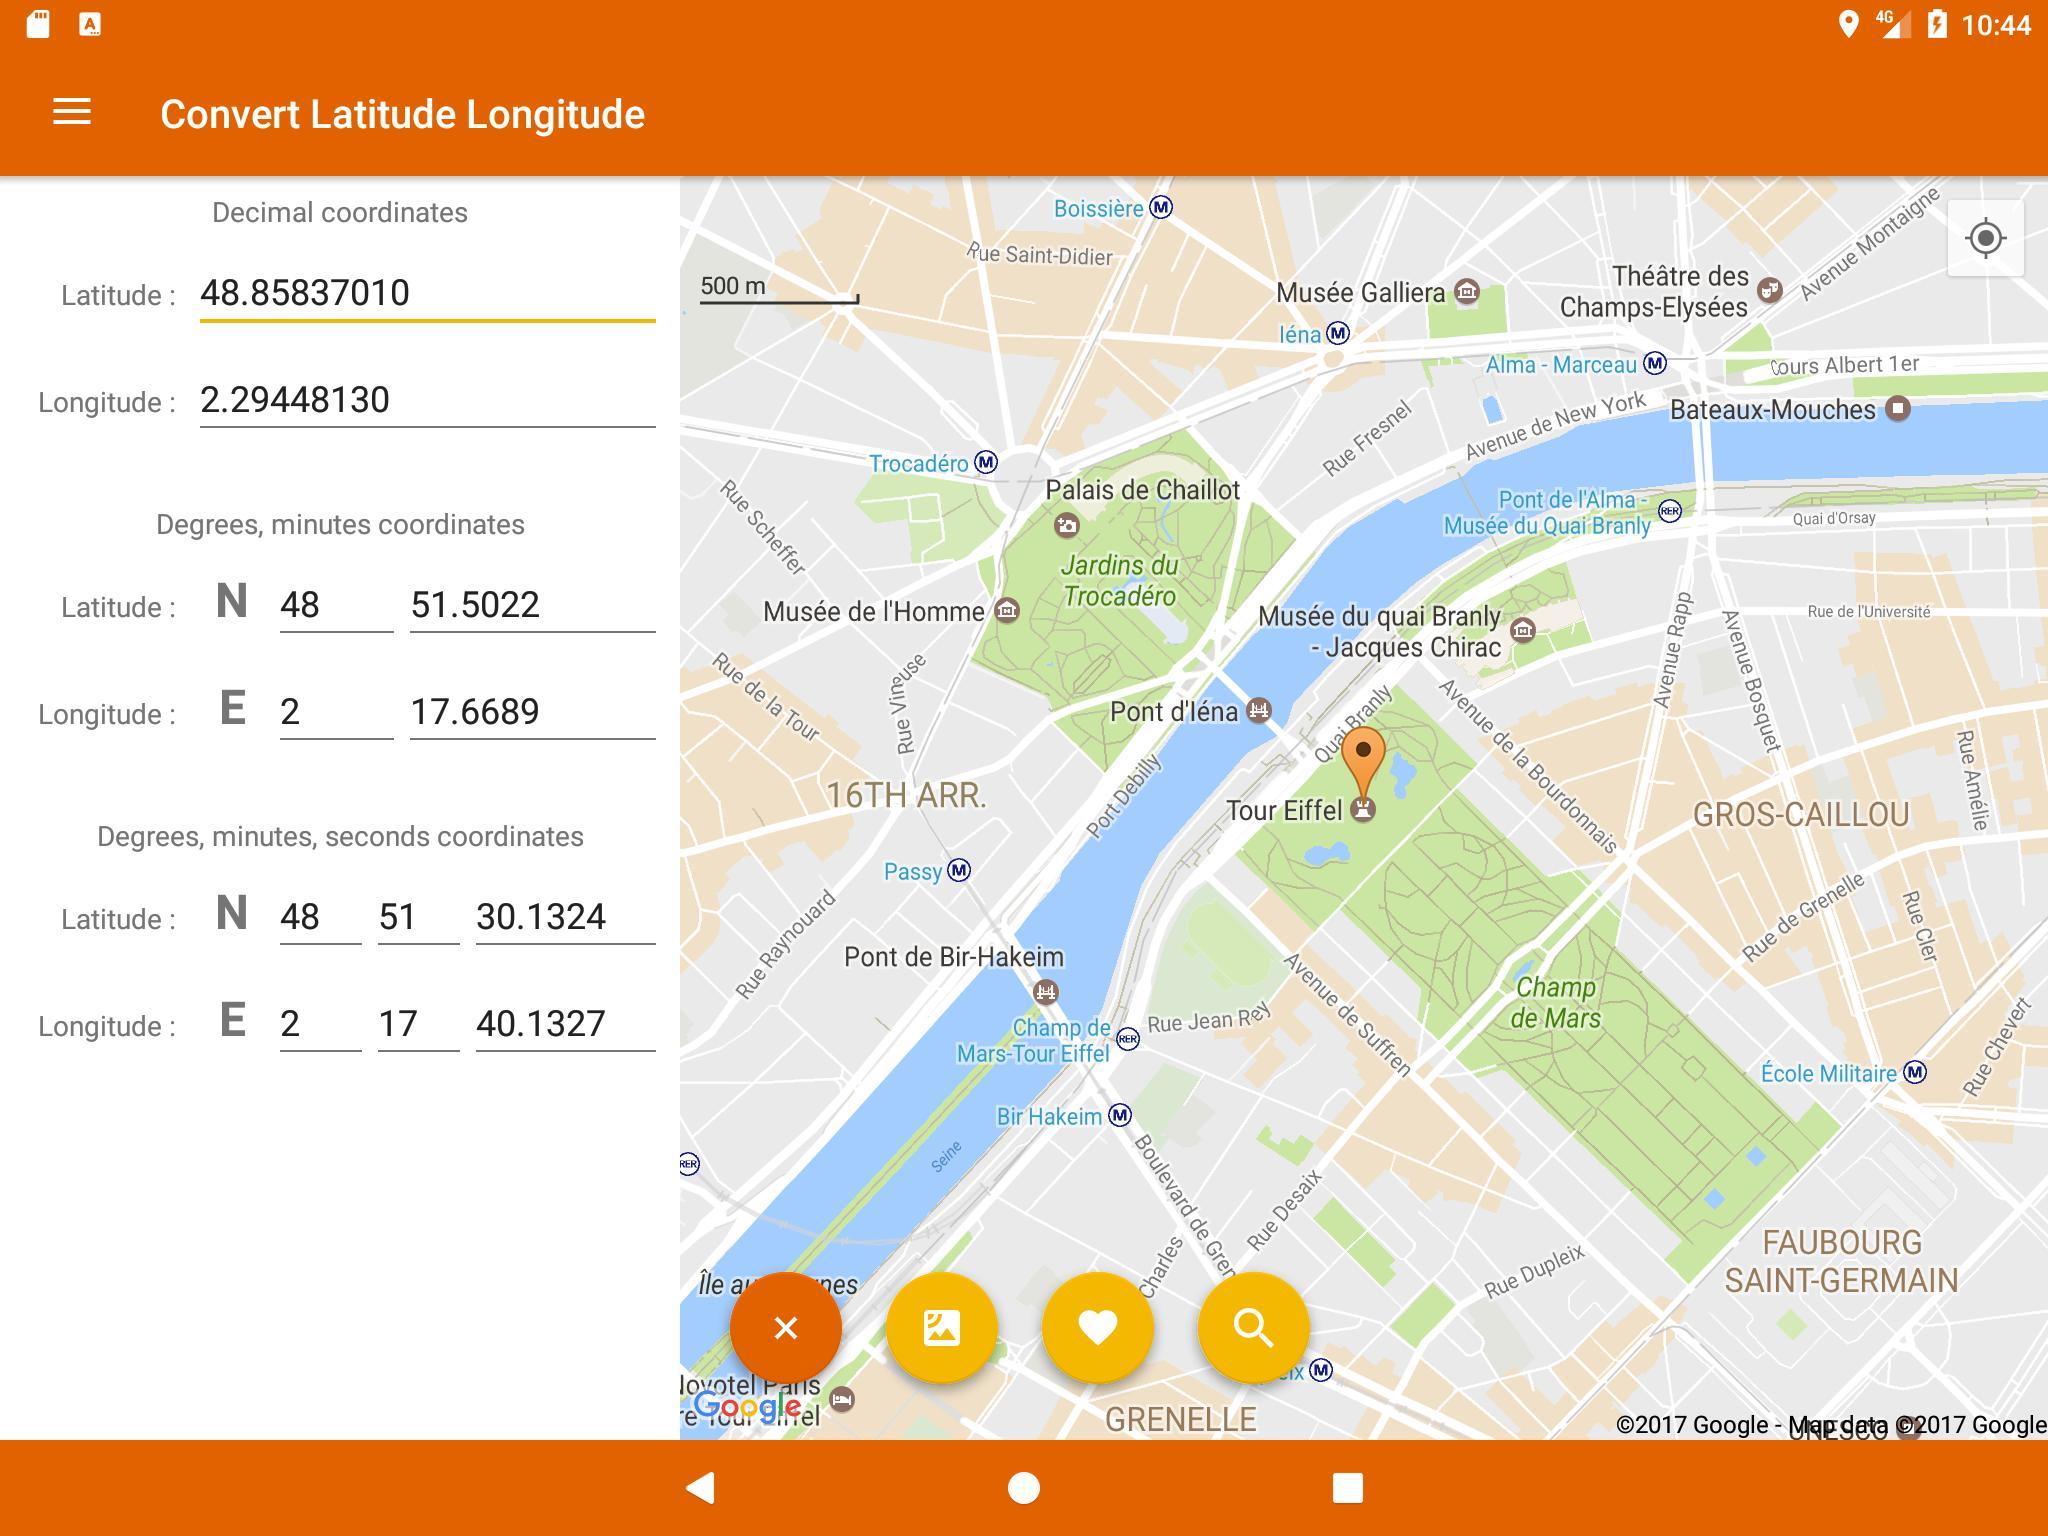 Latitude Longitude Convert for Android - APK Download